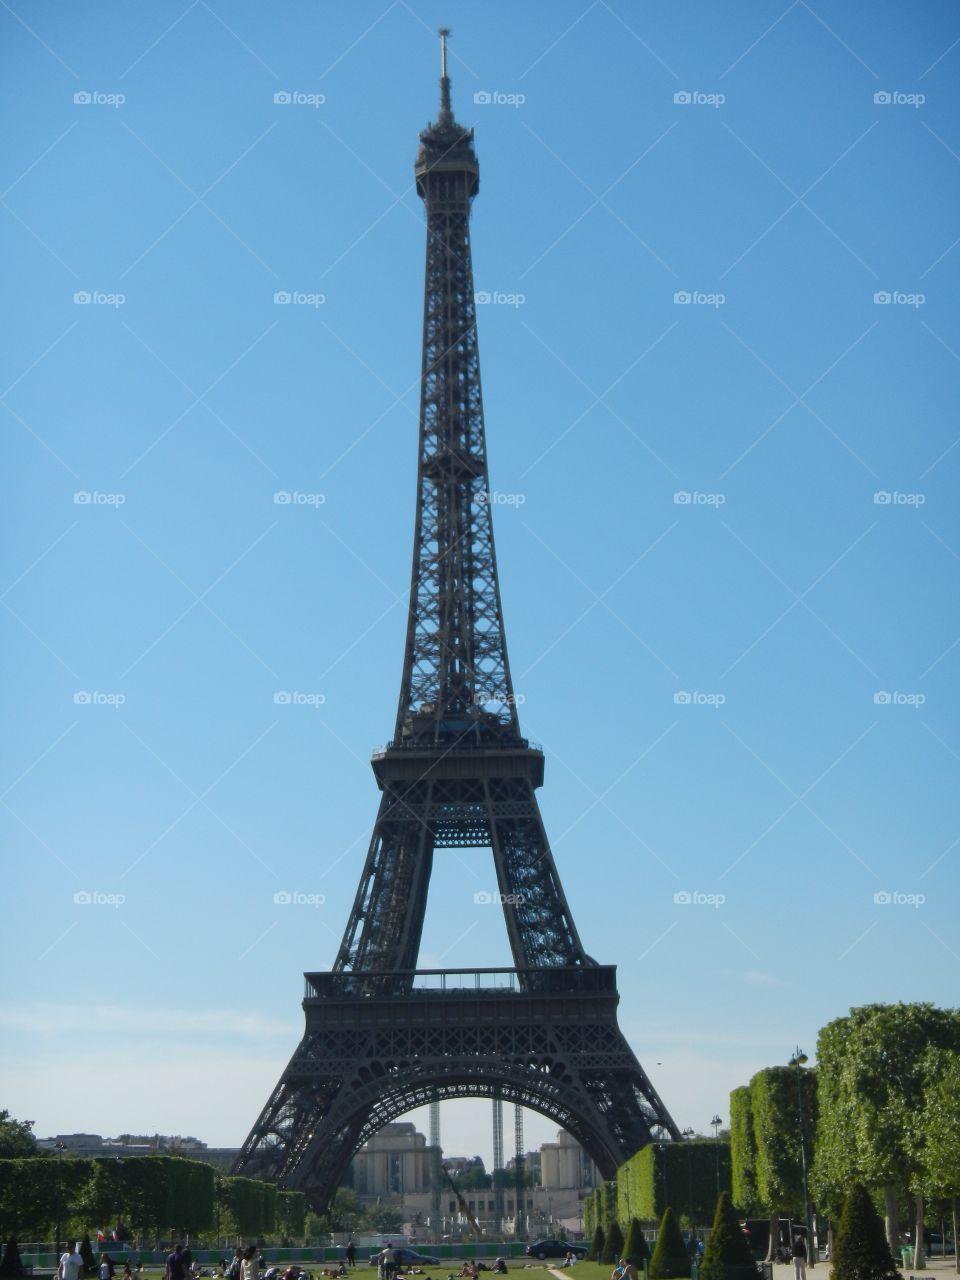 The Eiffel Tower, Paris, France. Chelsea Merkley. May 2012. Copyright © CM Photography 2012 🇫🇷